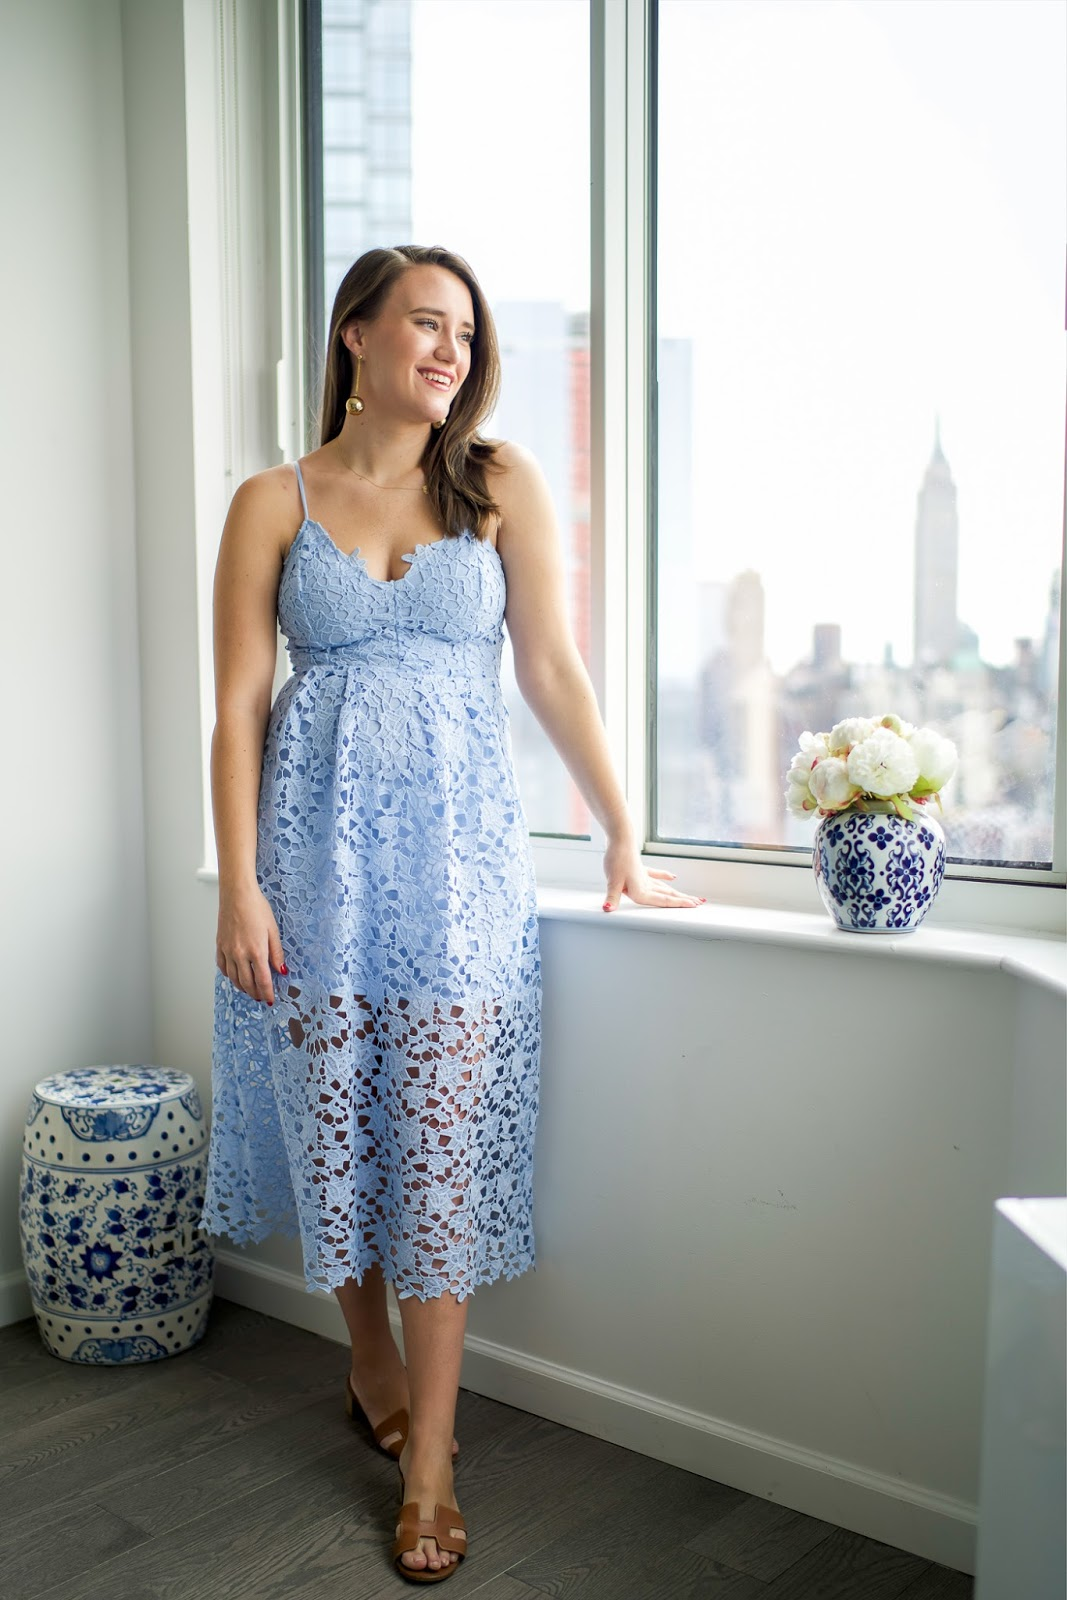 Lace Midi Dress For Spring Popular New York City Fashion